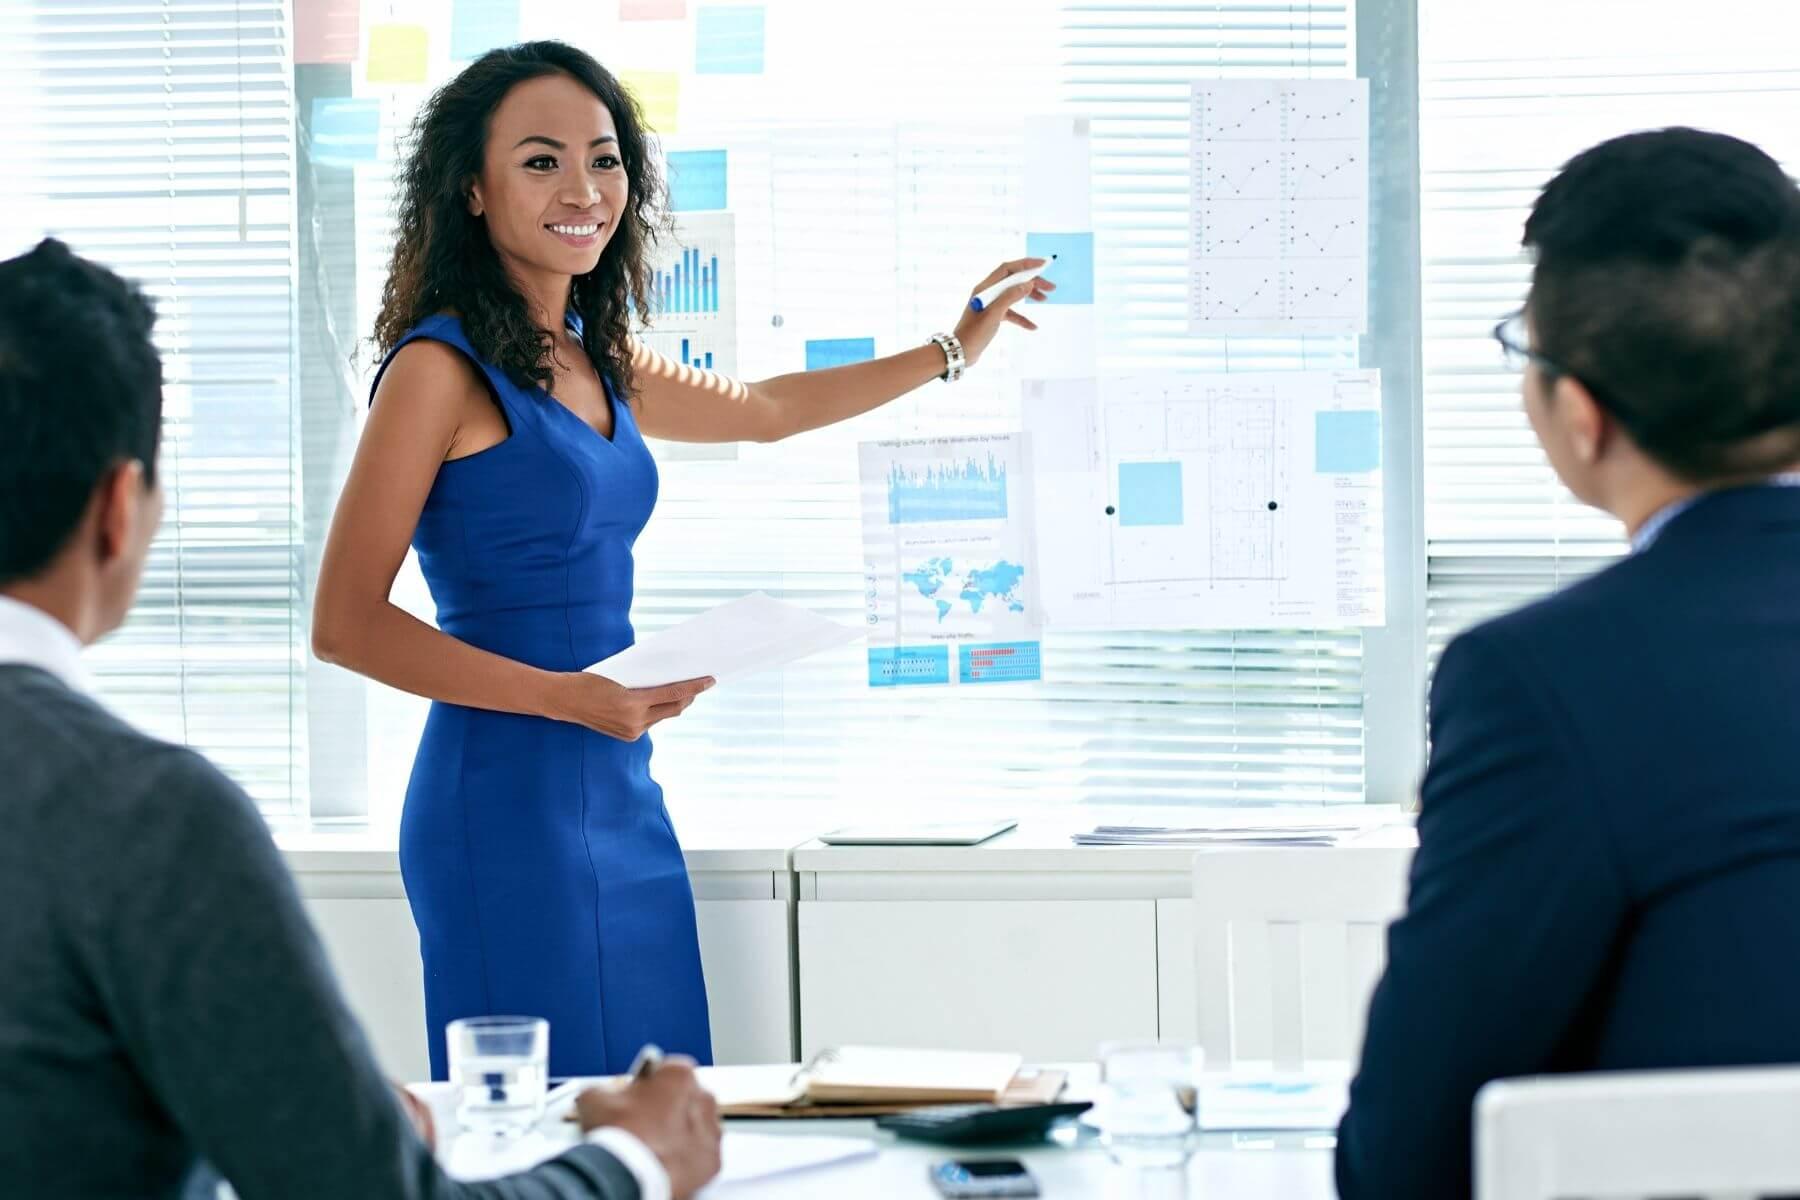 Female professional presents in a corporate setting.